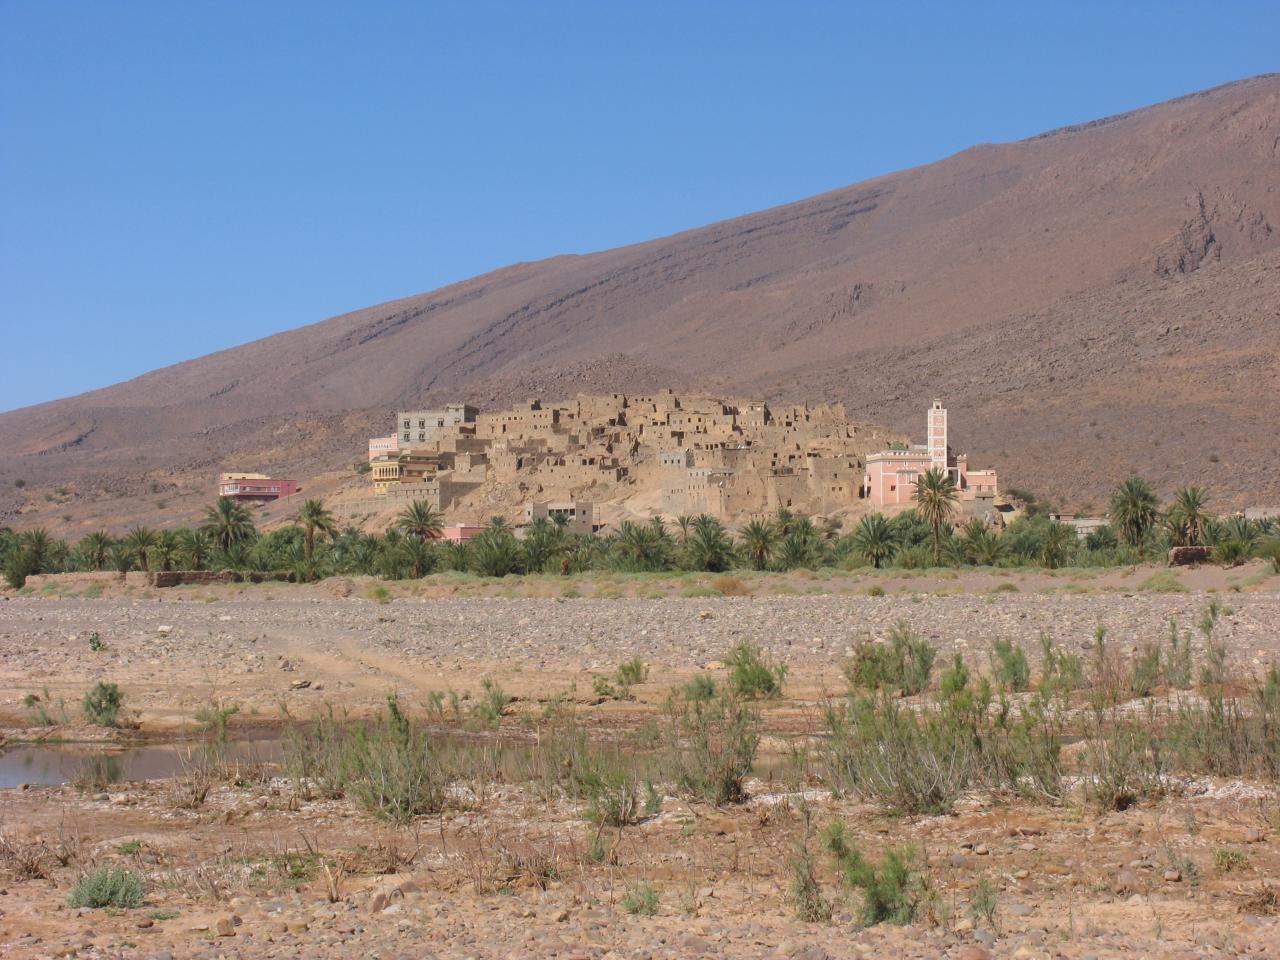 Tamzarout village